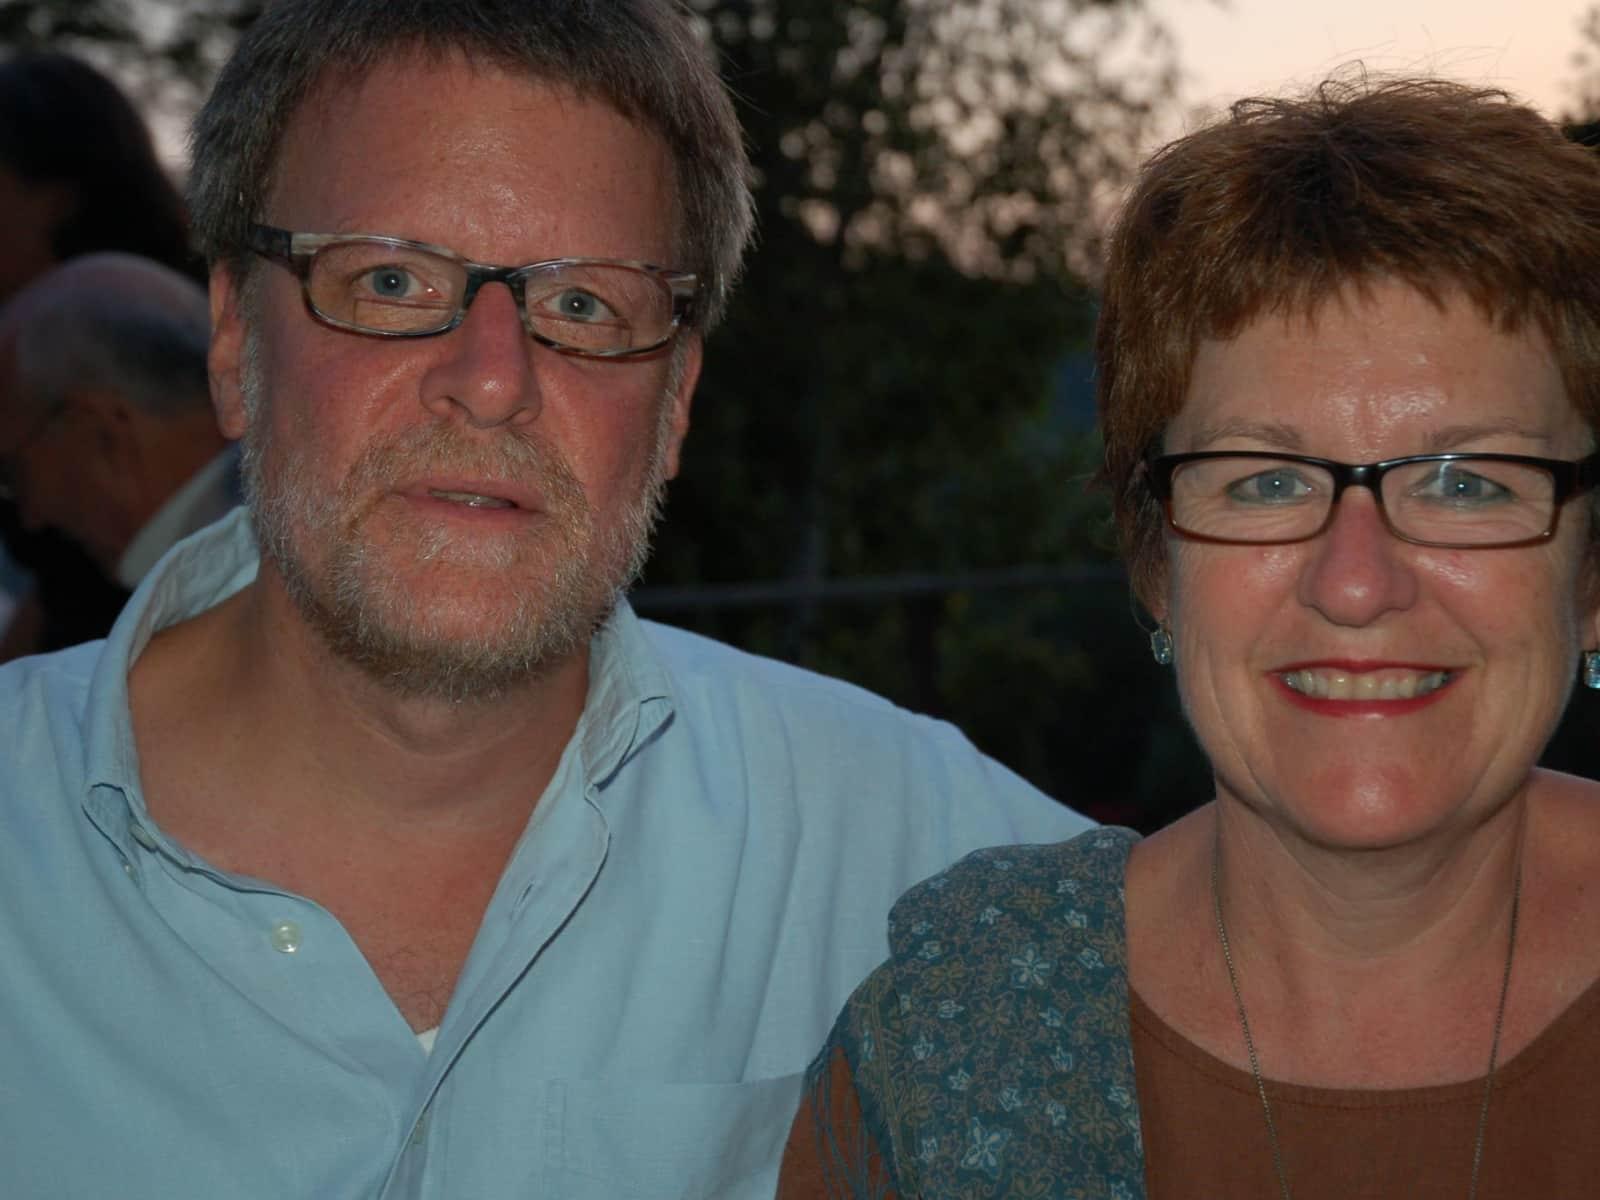 Jude & Richard from Ottawa, Ontario, Canada